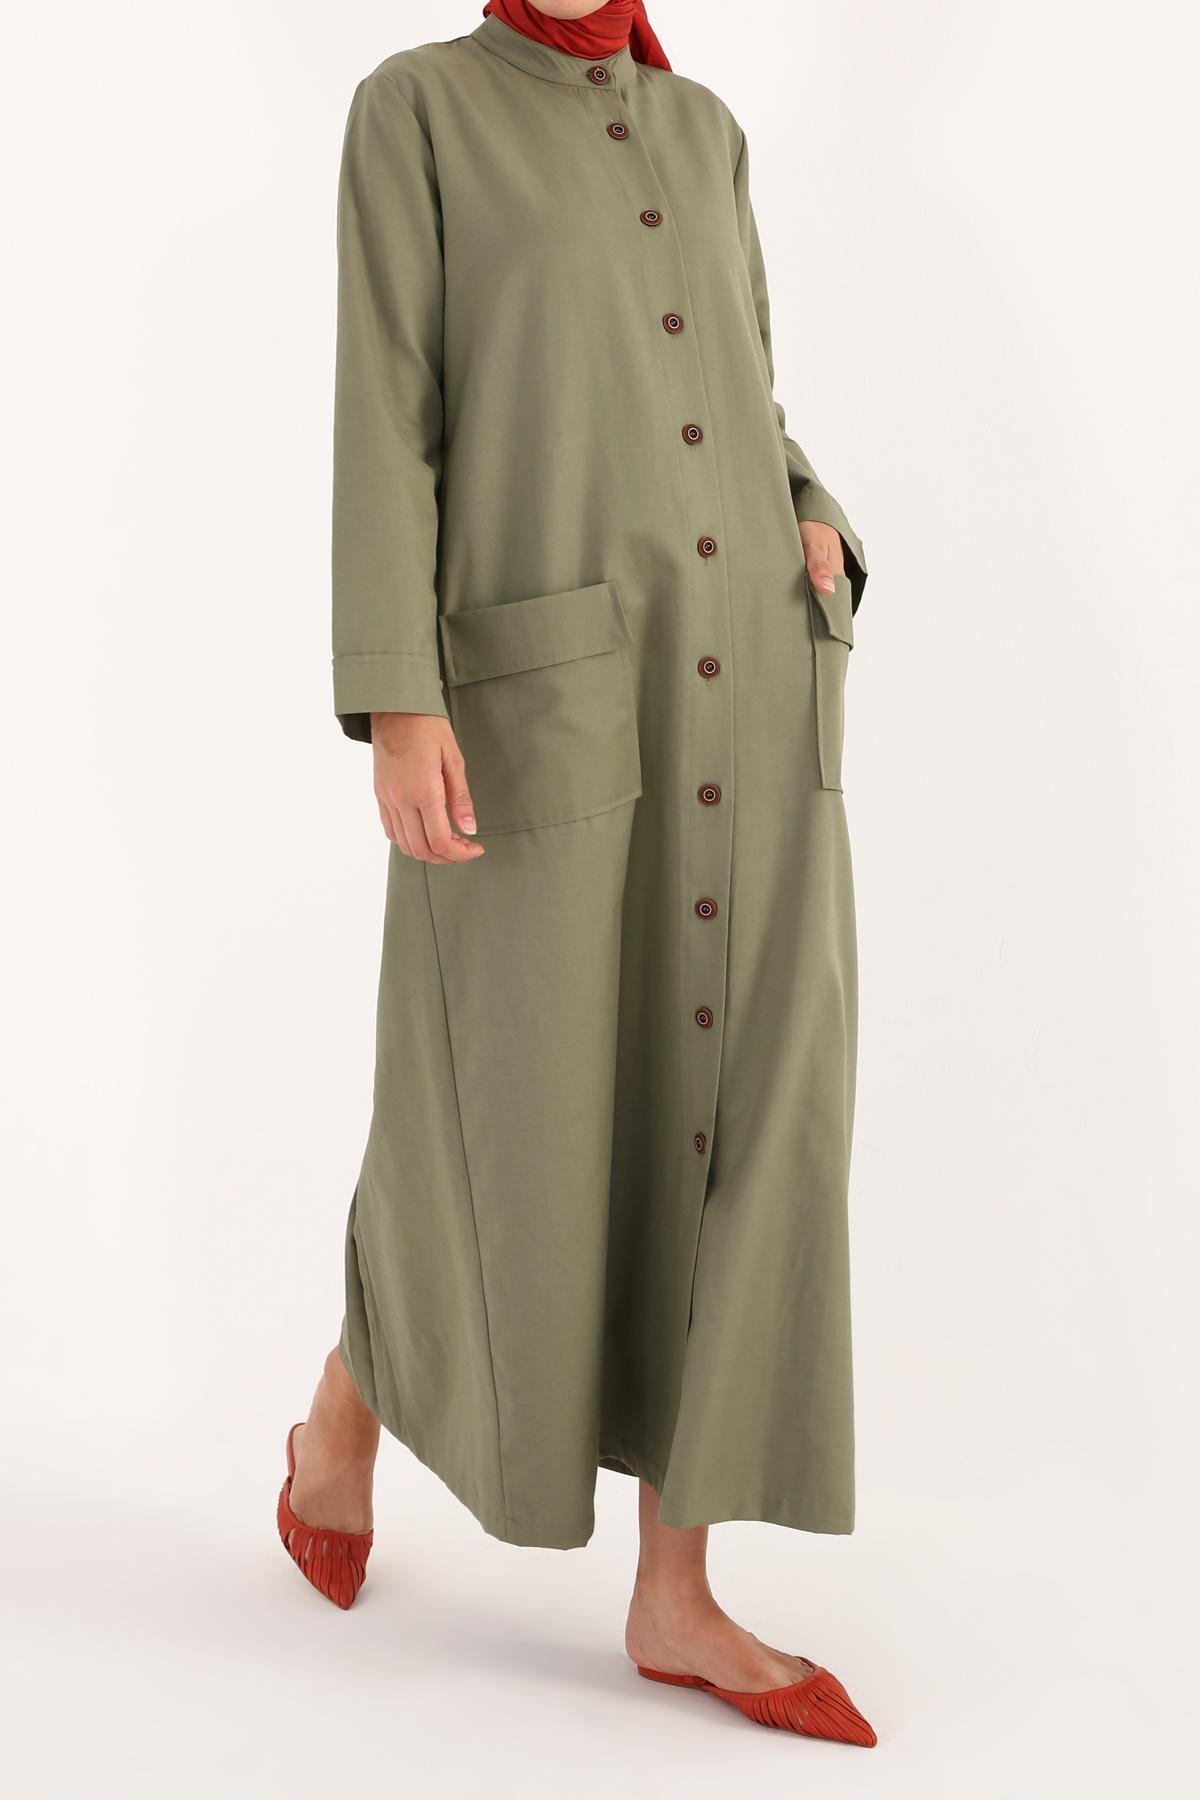 100% Cotton Button Front Epaulette Abaya